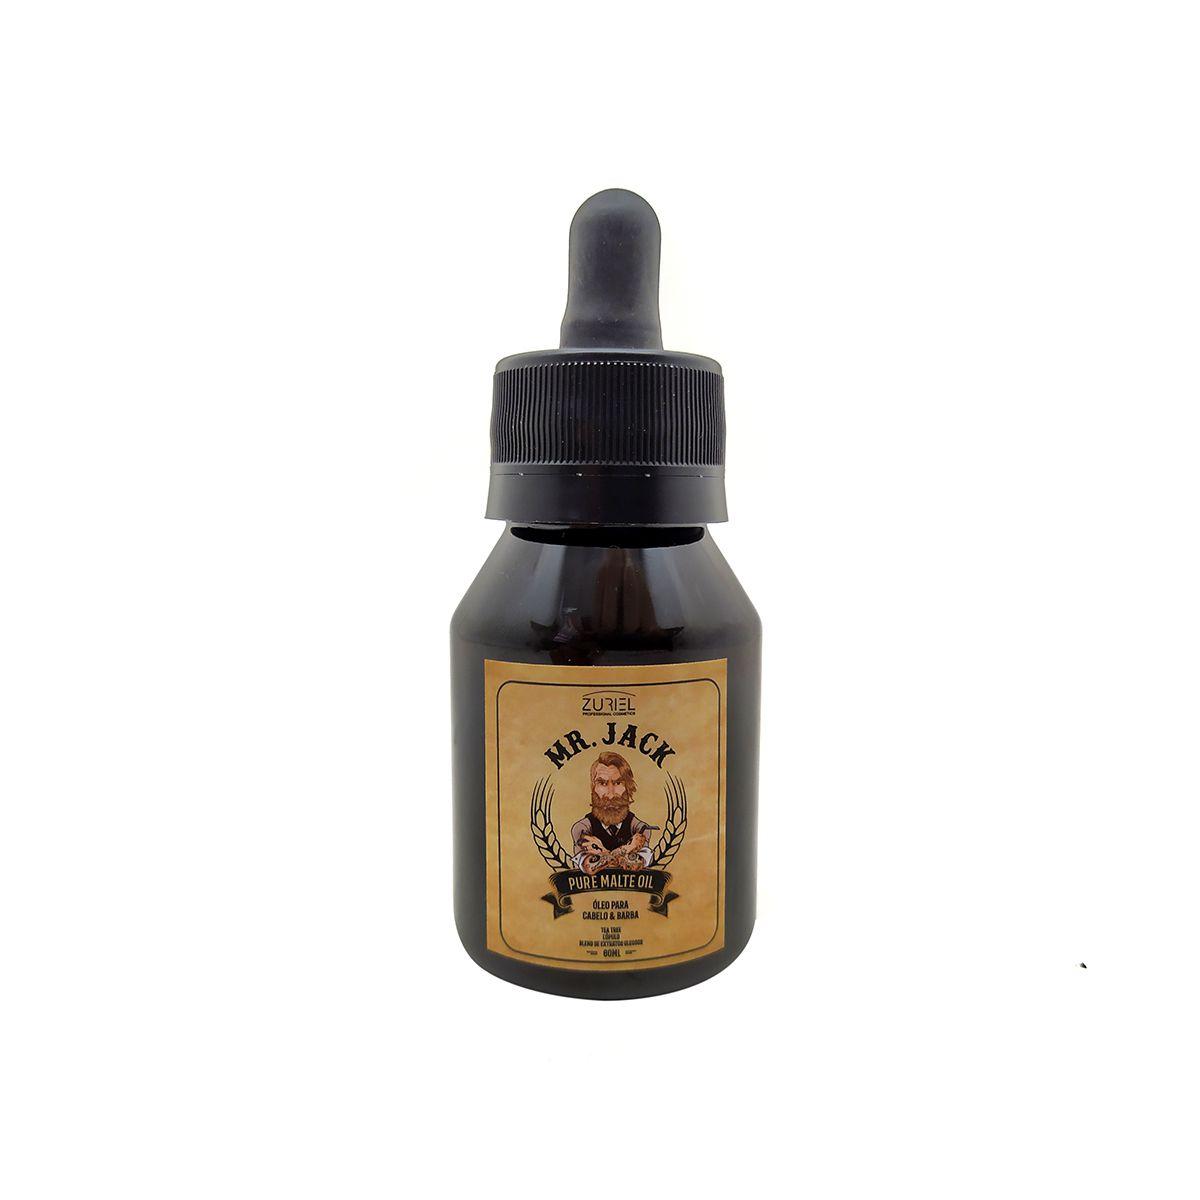 Óleo para Barba e Cabelo Pure Malt Oil Mr Jack - 60ml